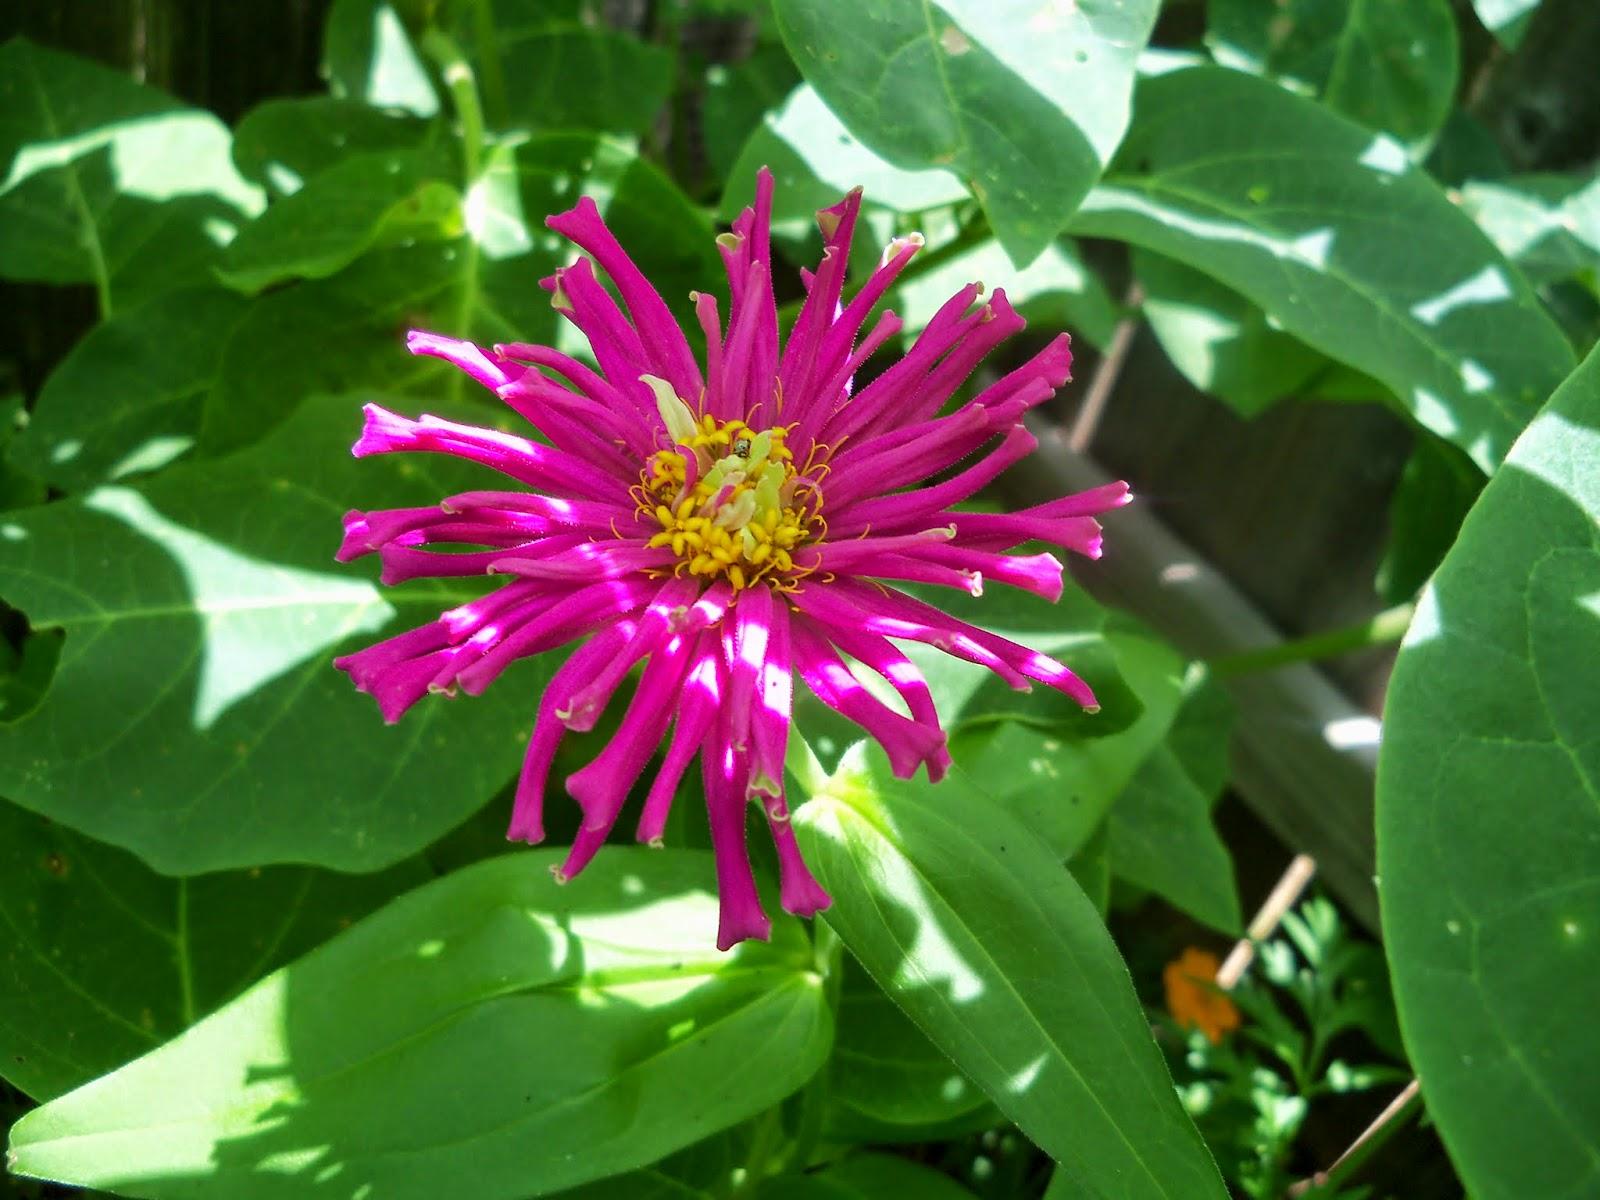 Gardening 2014 - 116_2979.JPG